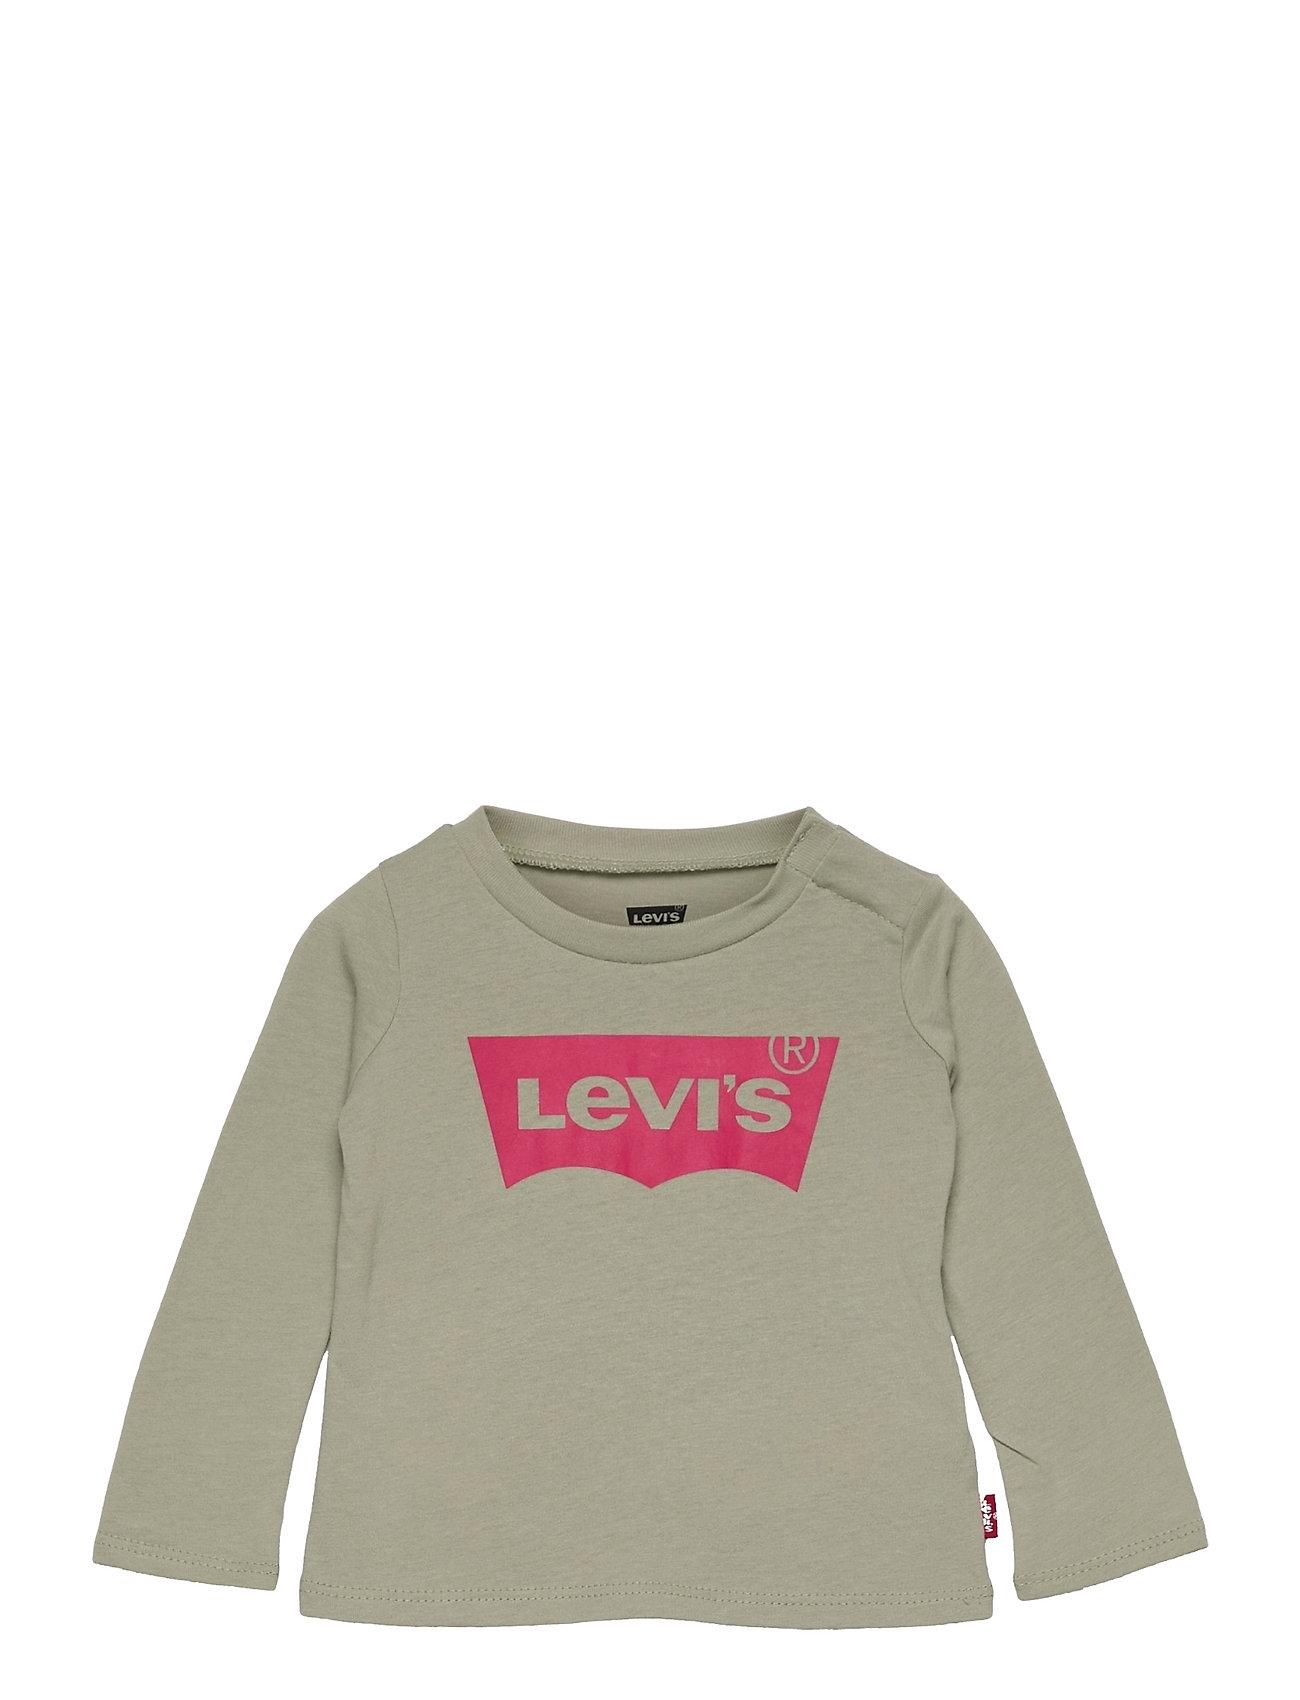 L/S Batwing Tee Langærmet T-shirt Grøn Levi's